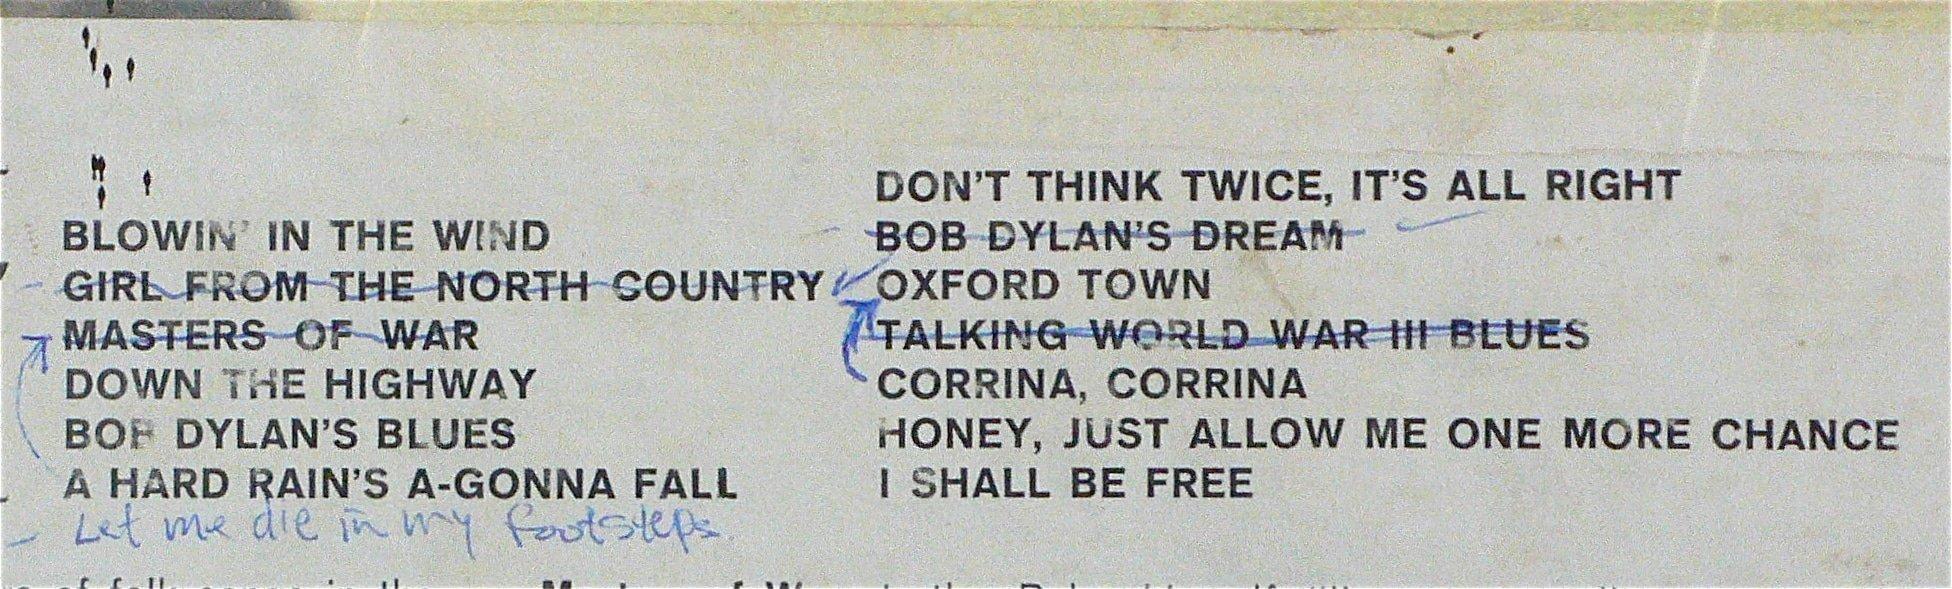 "An Original ""Freewheelin' Bob Dylan"" With 4 Withdrawn Tracks Surfaces"